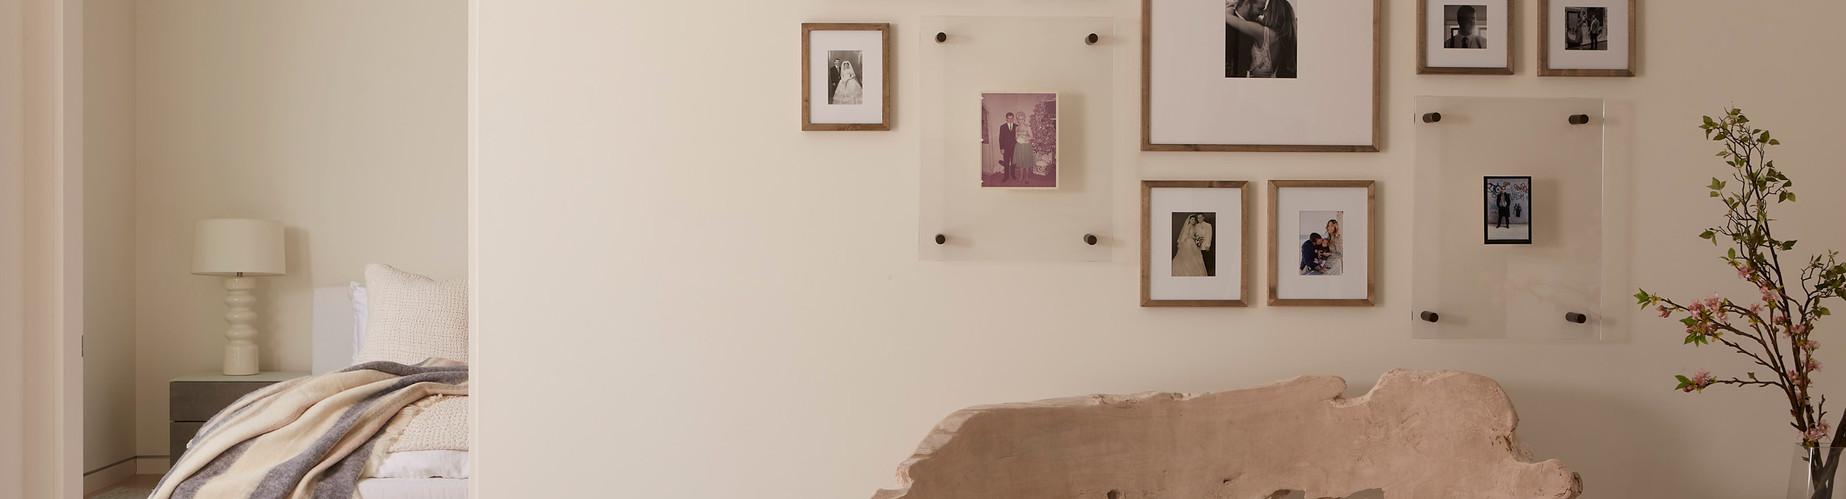 Studio City Hamptons Family Gallery Wall